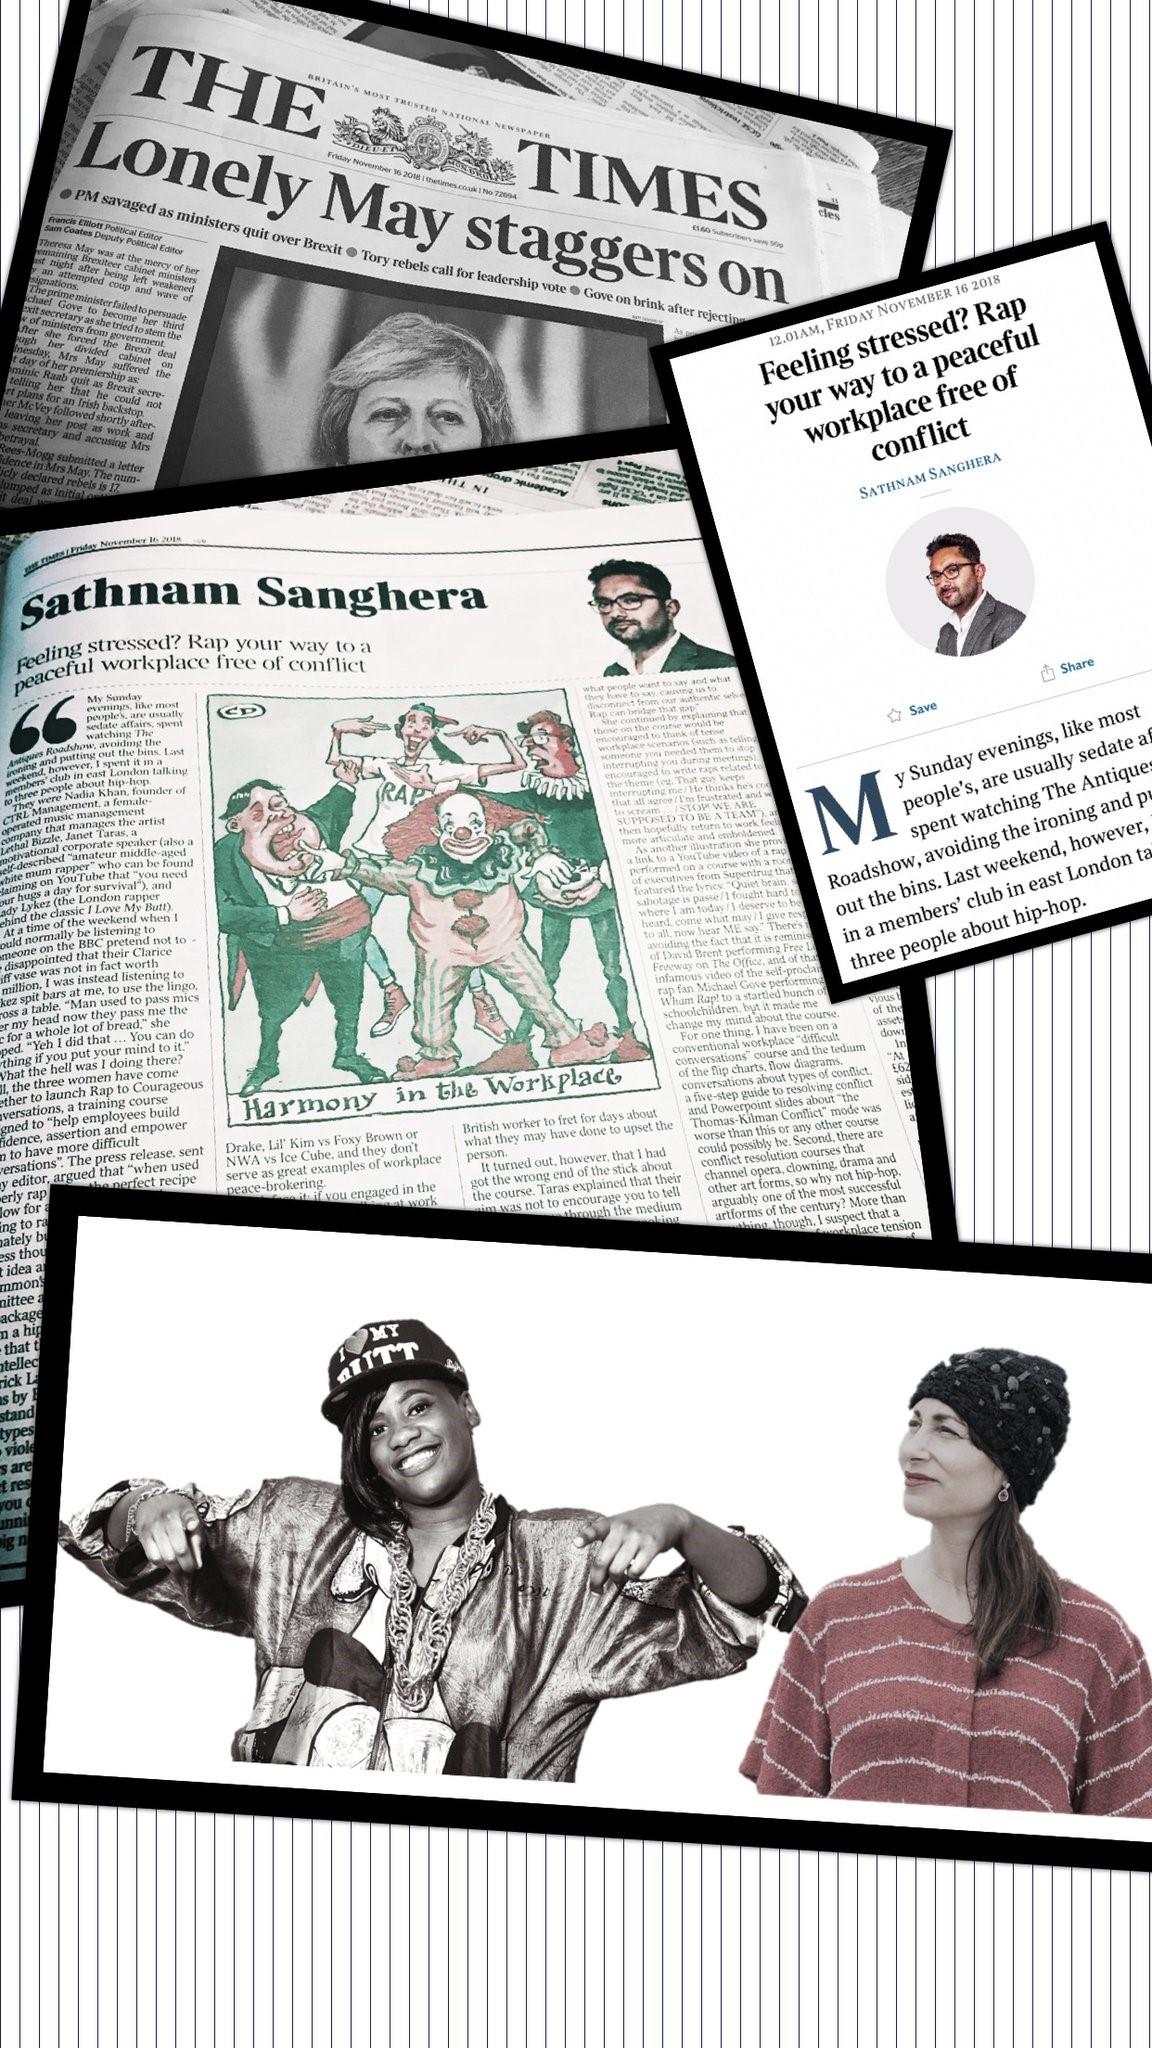 rapper makes the press!